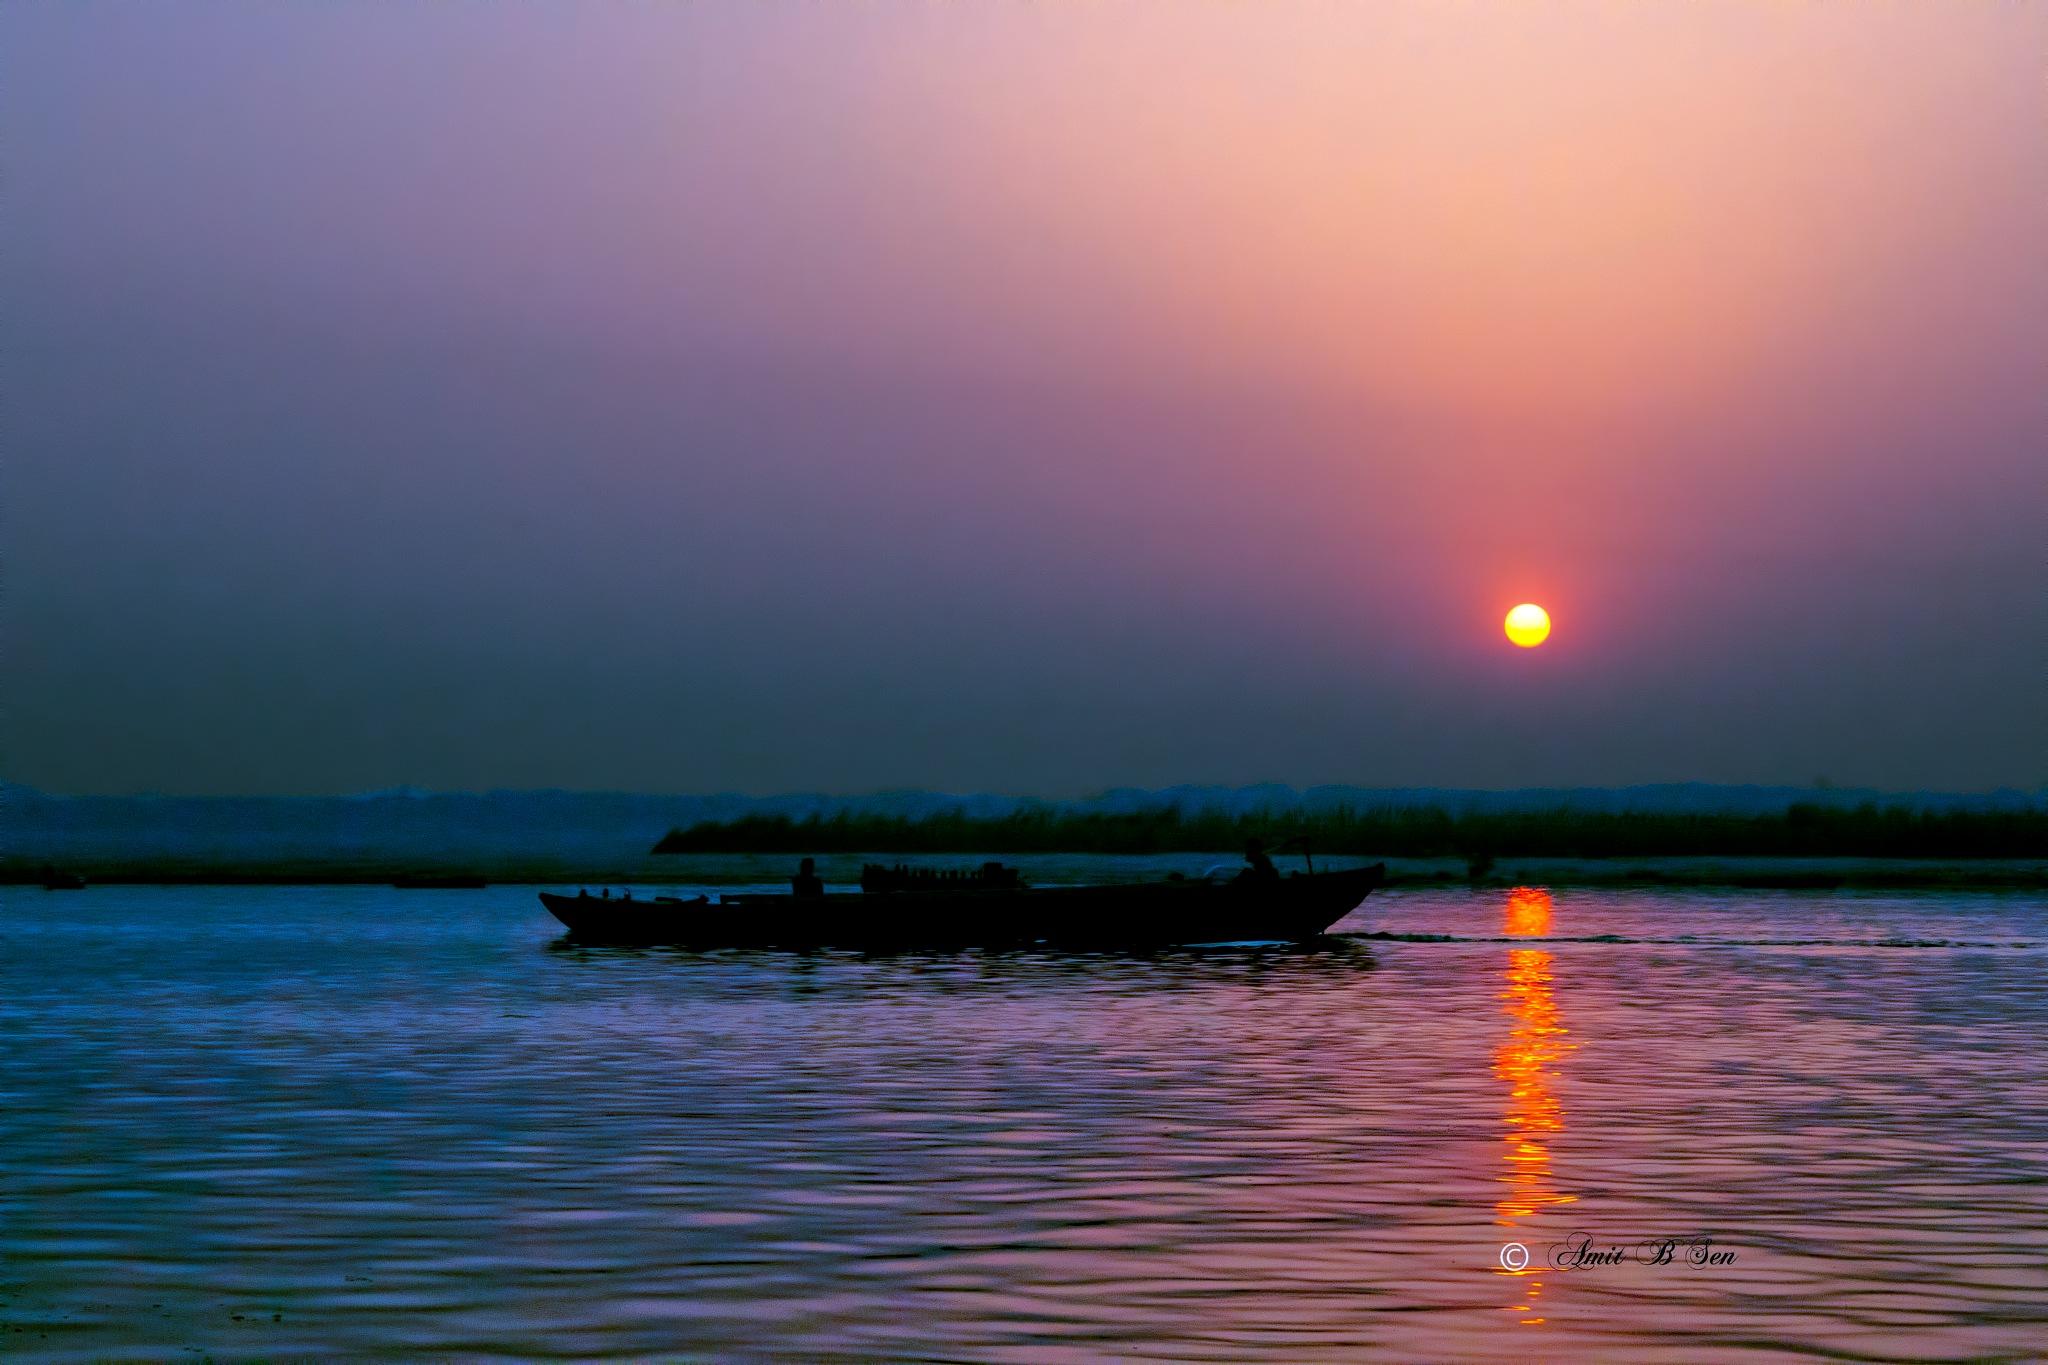 Sunrise 3 by Amit Baran Sen